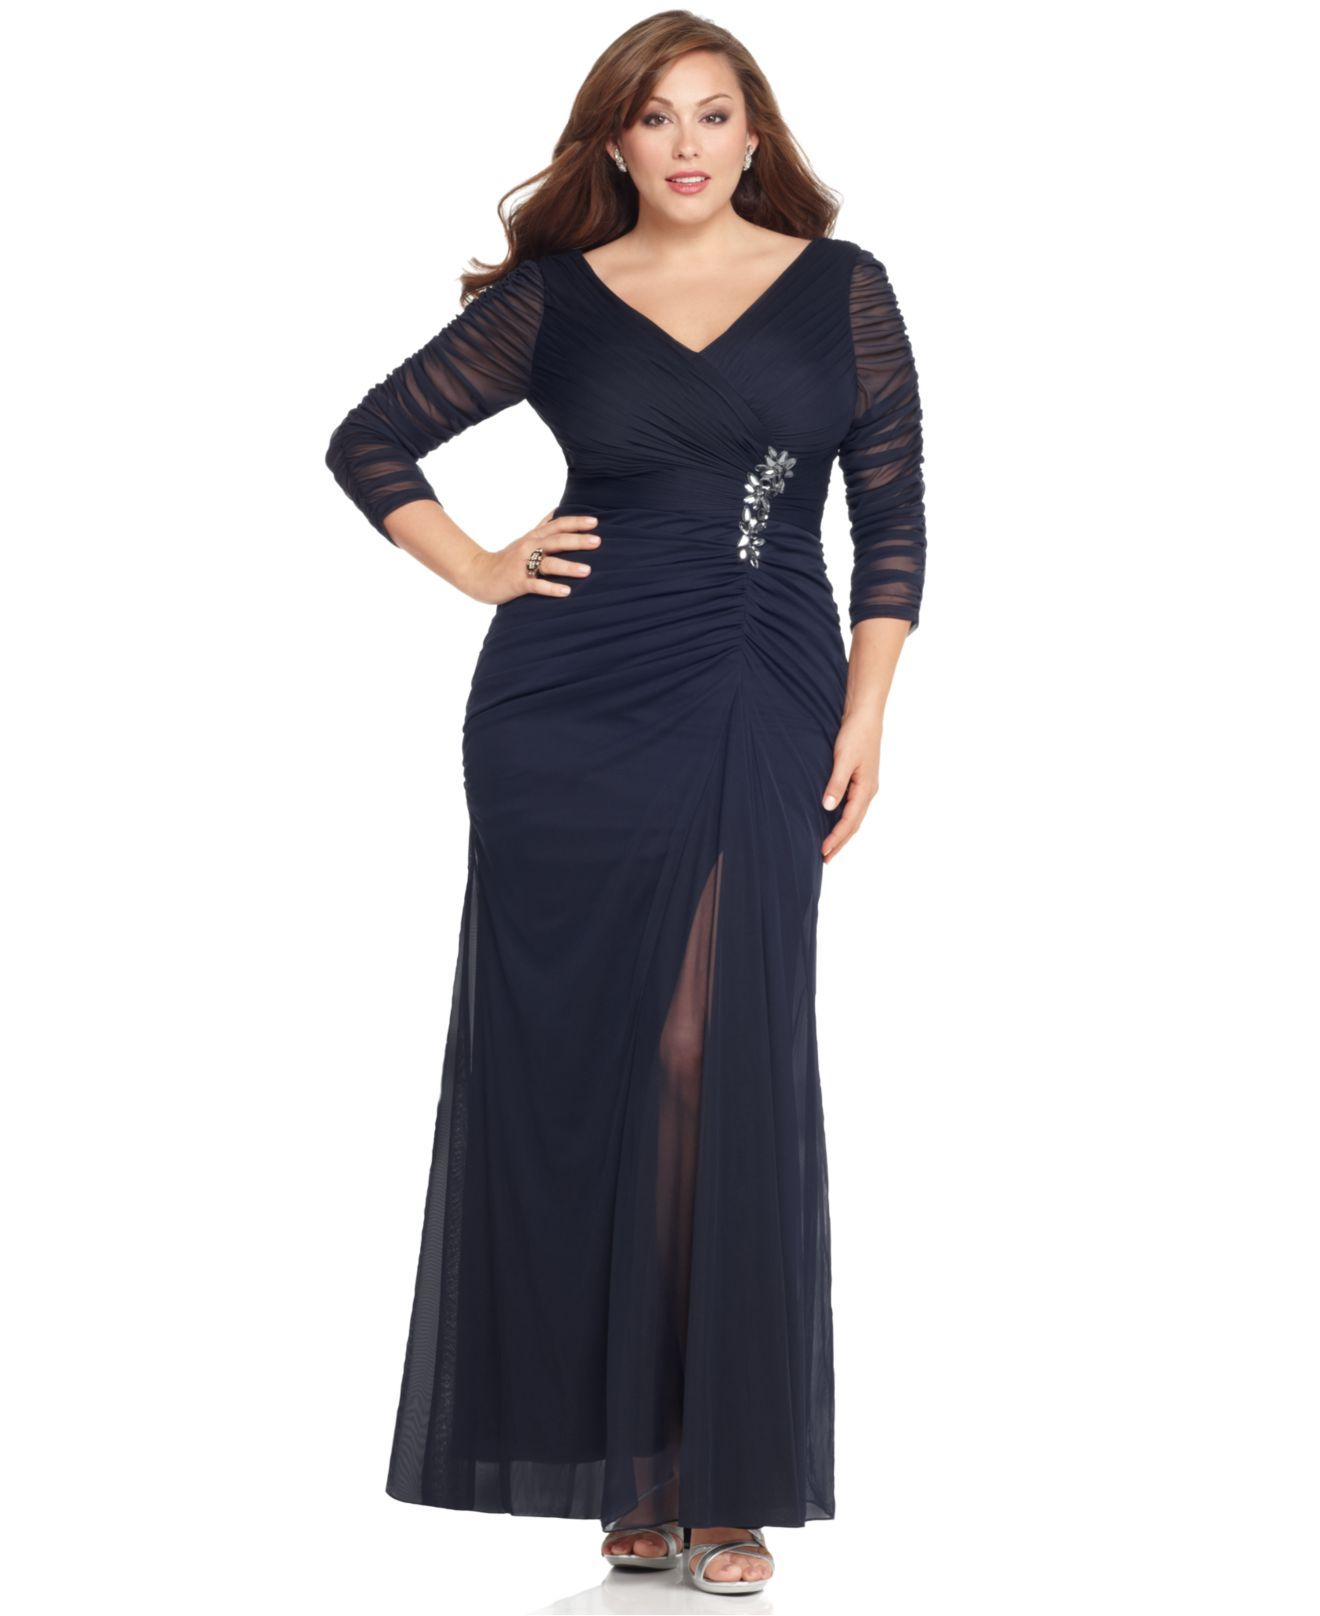 921afa3f886 Adrianna Papell Plus Size Dress